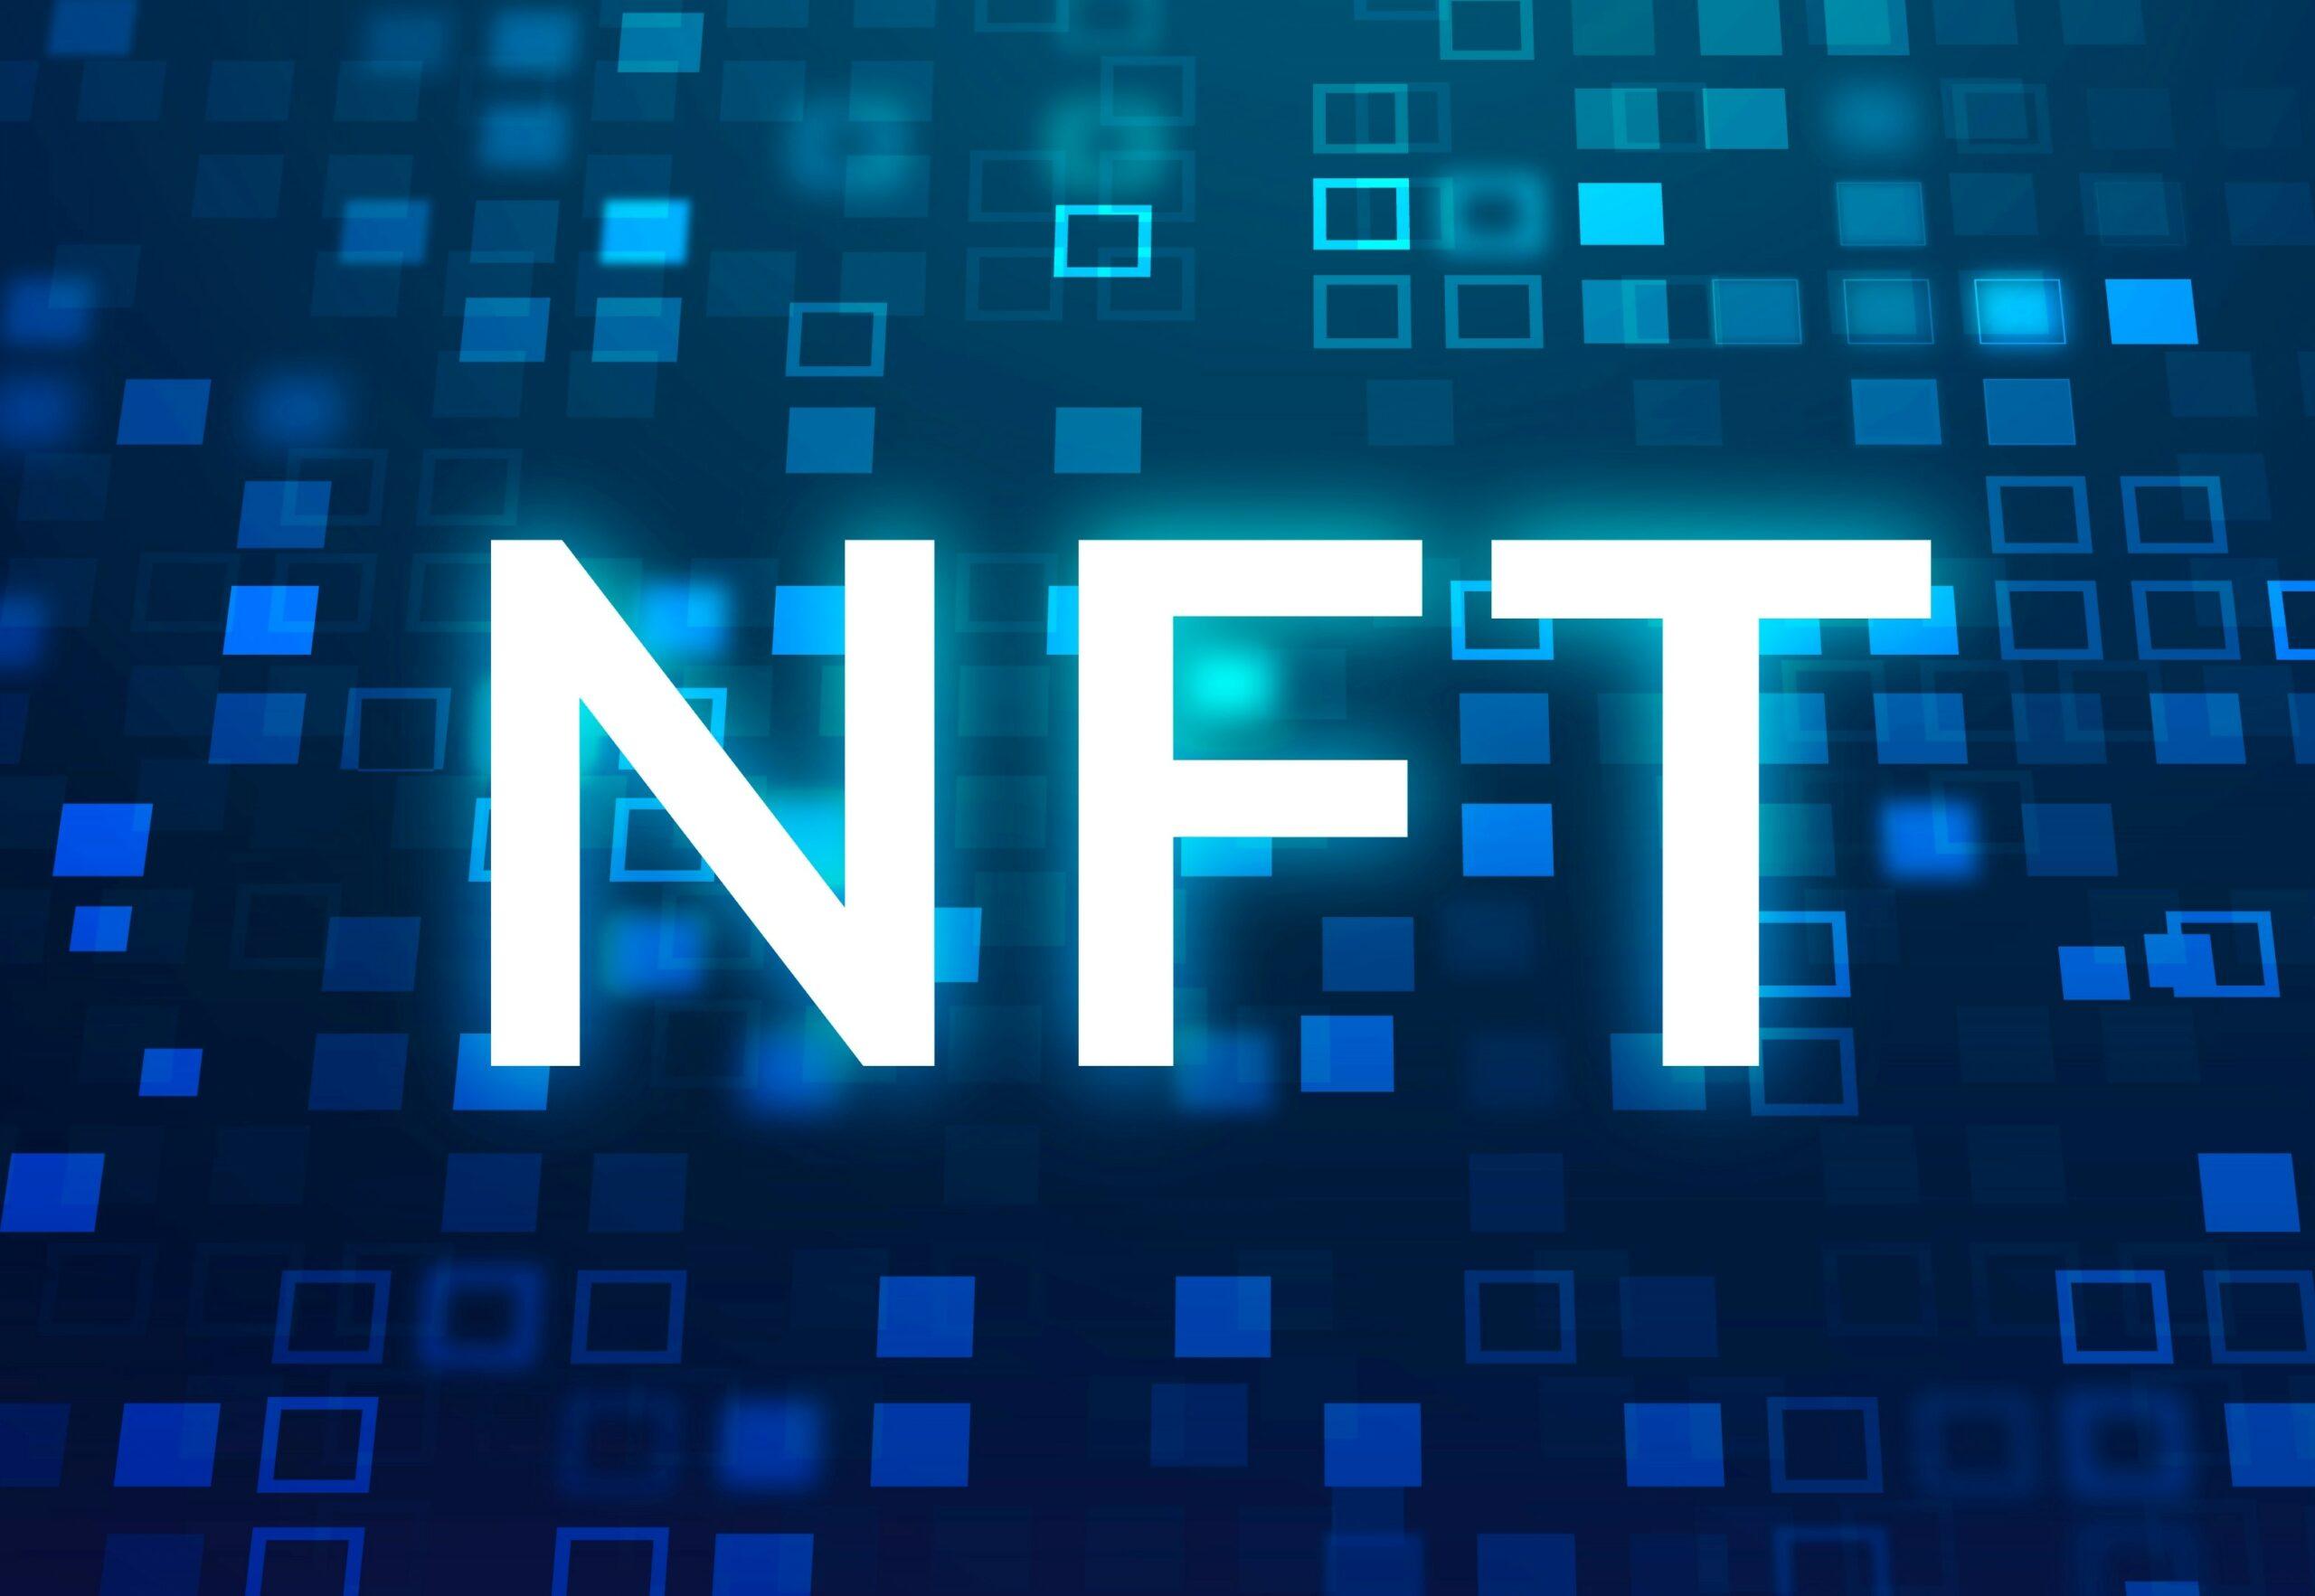 NFT ripple